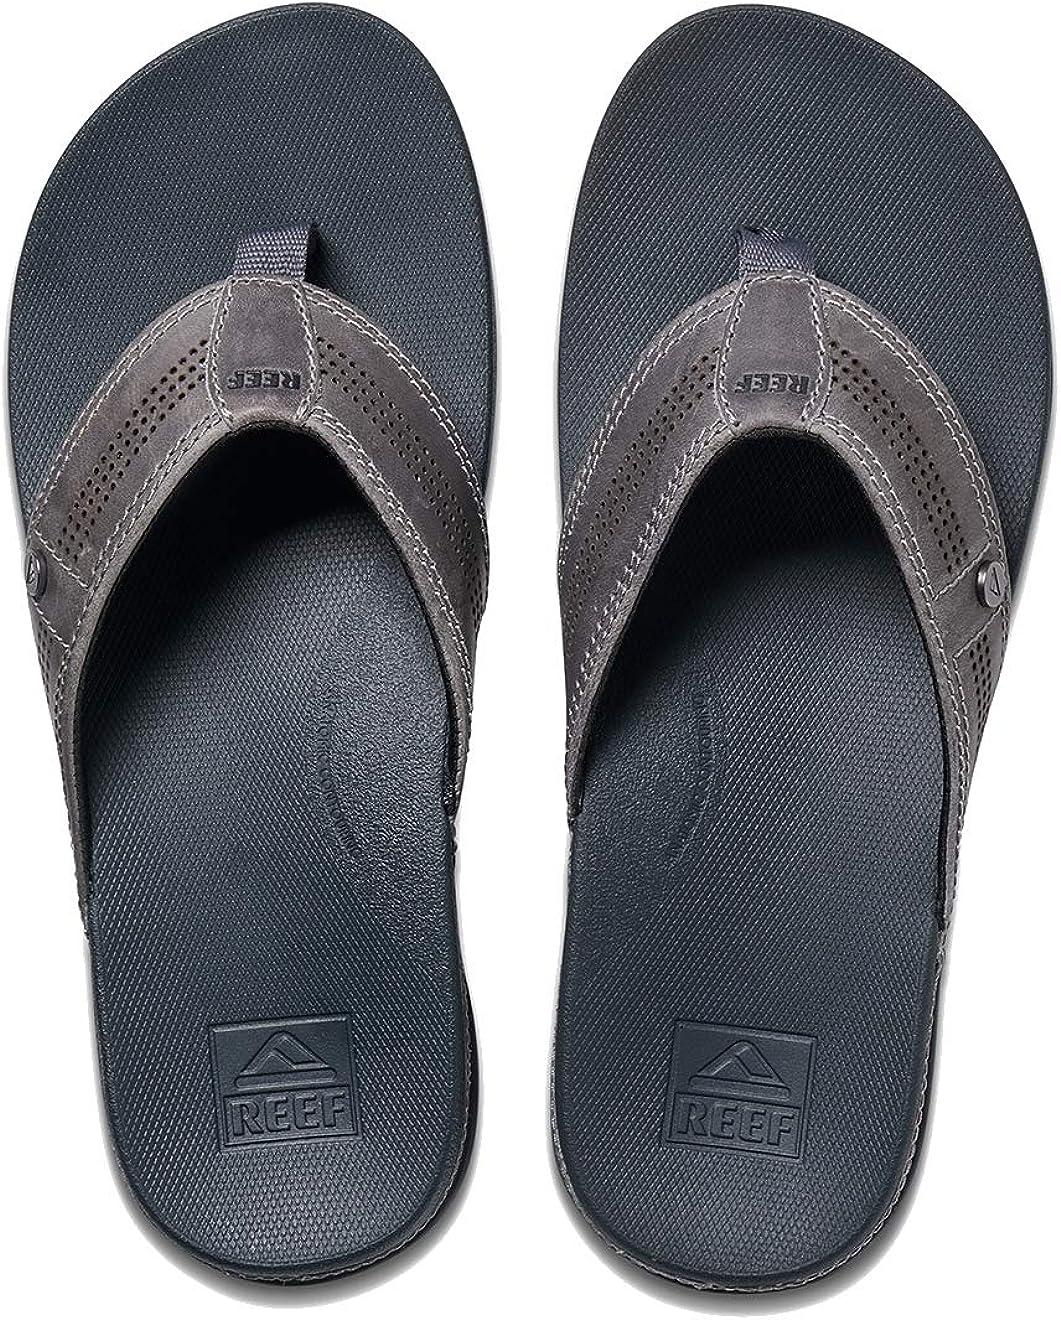 Reef Mens Sandals Cushion Lux